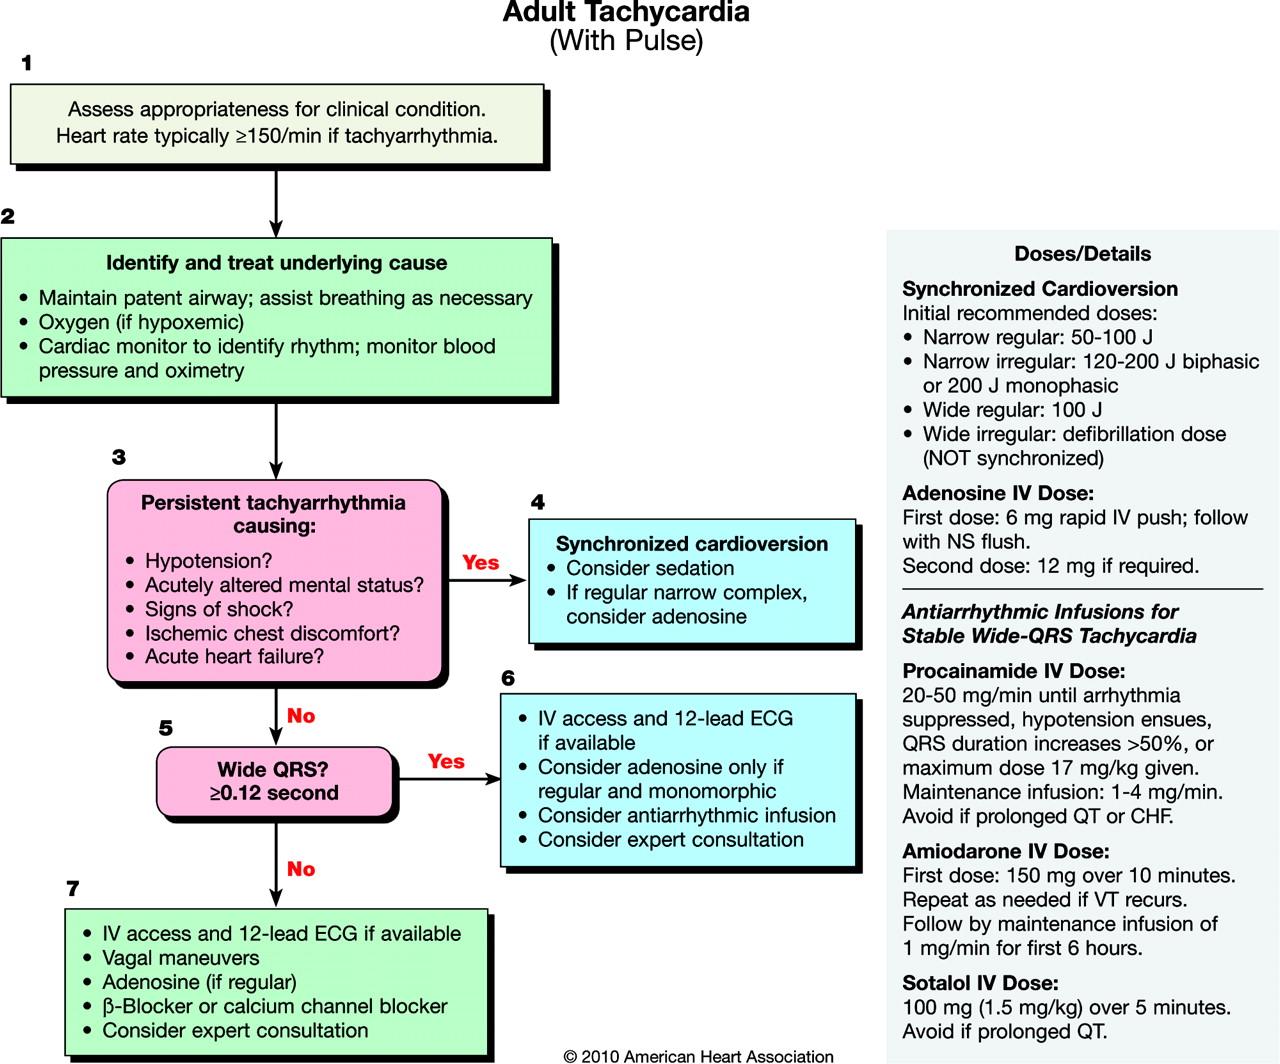 acls tachycardia pulse adult algorithm algorithms association heart american